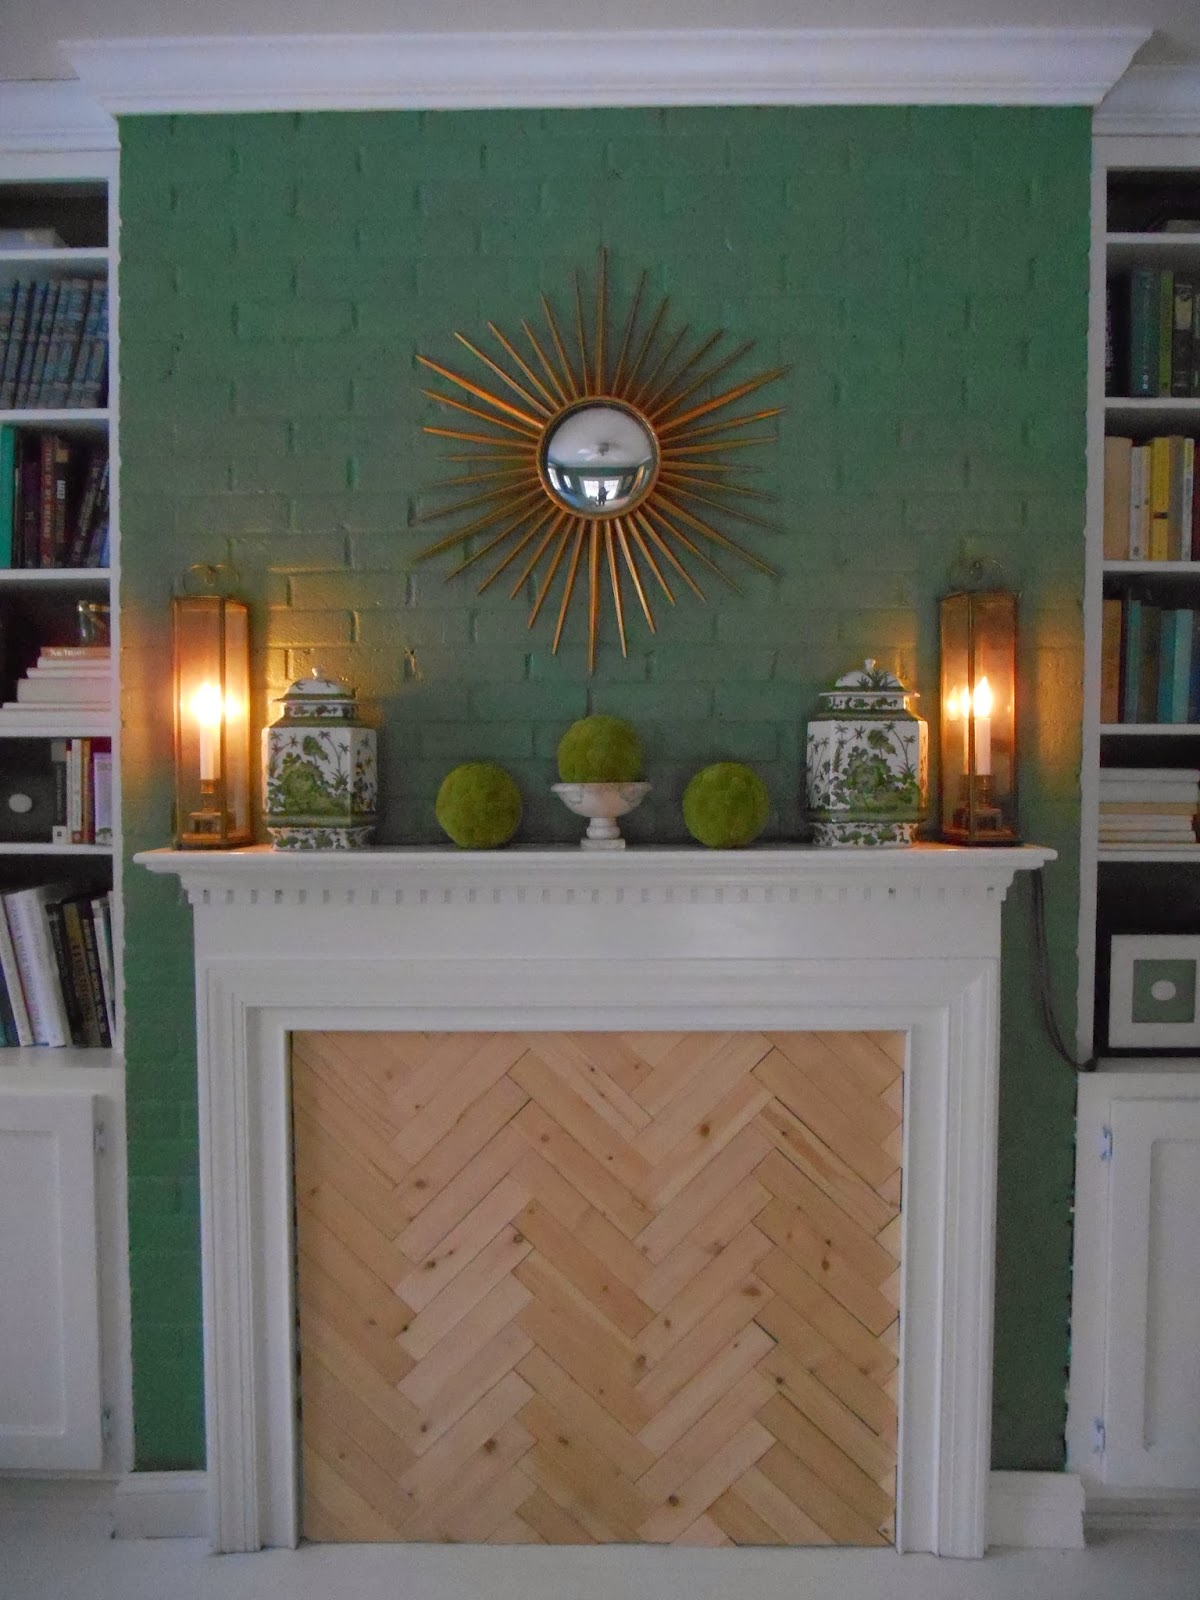 My notting hill blog - One Room Challenge Now The Herringbone Insert